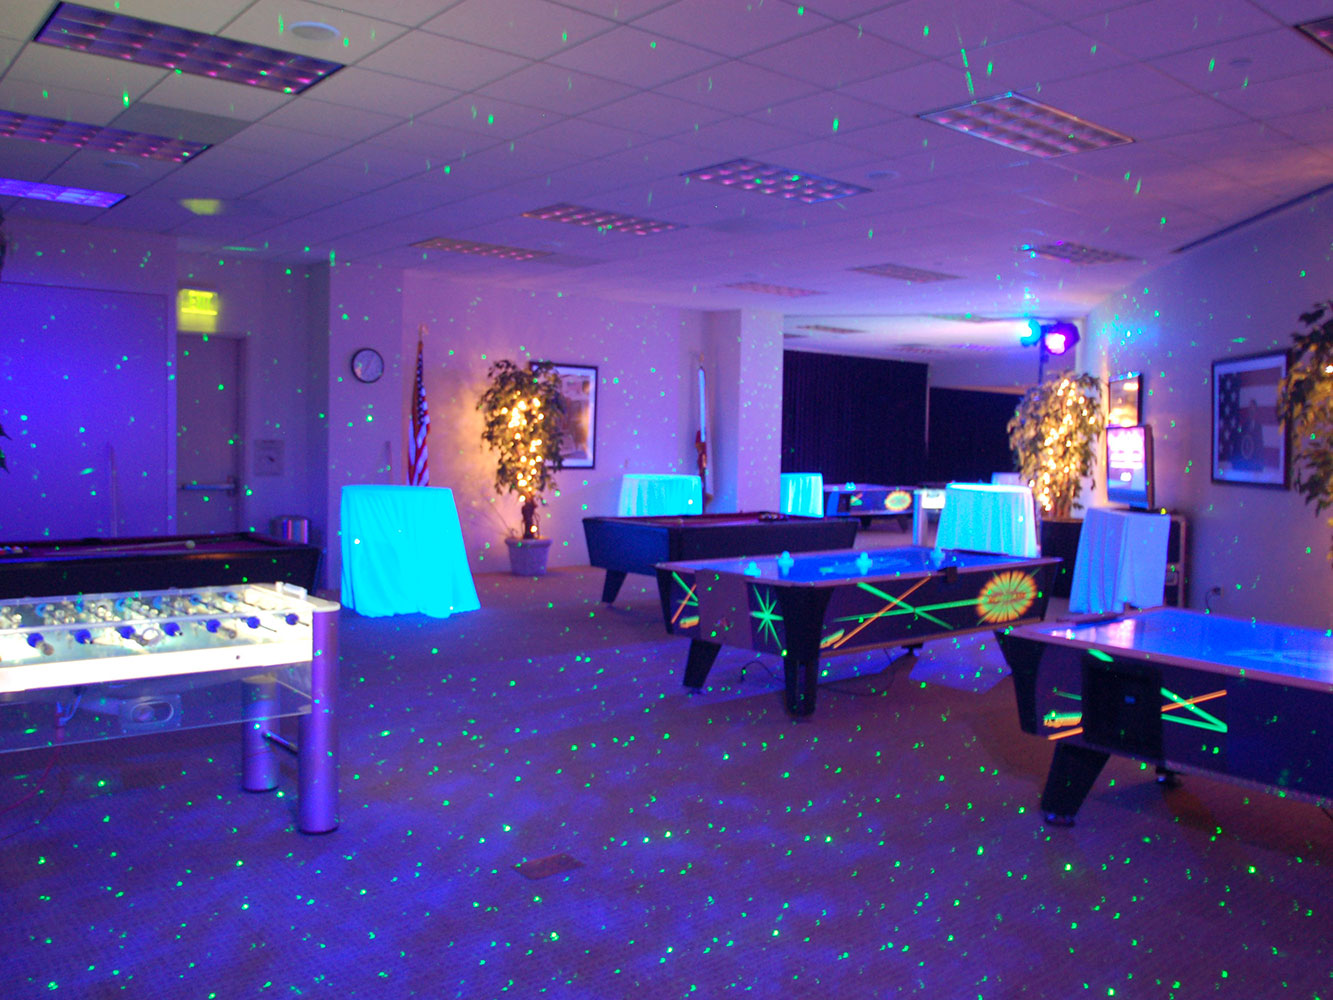 Intuit-Event-Indoor-Projection-Lighting